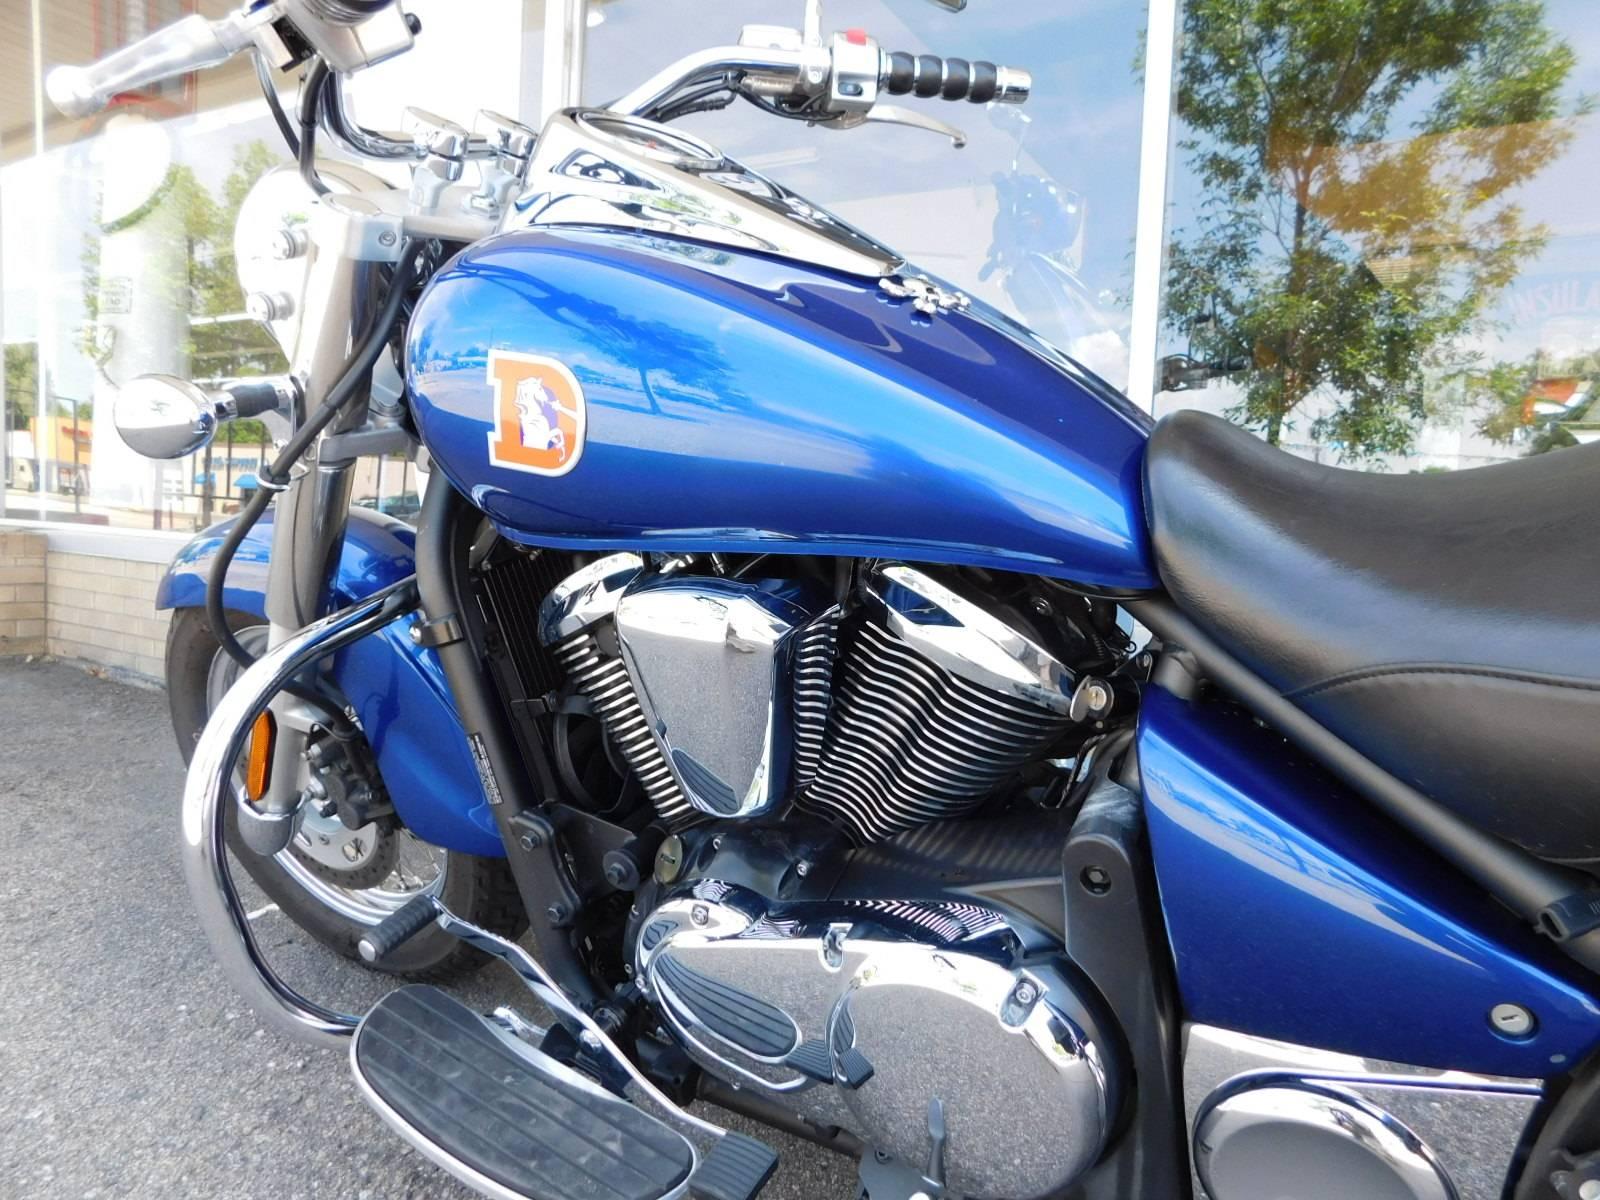 2010 Kawasaki Vulcan 900 Classic Motorcycles Loveland Colorado